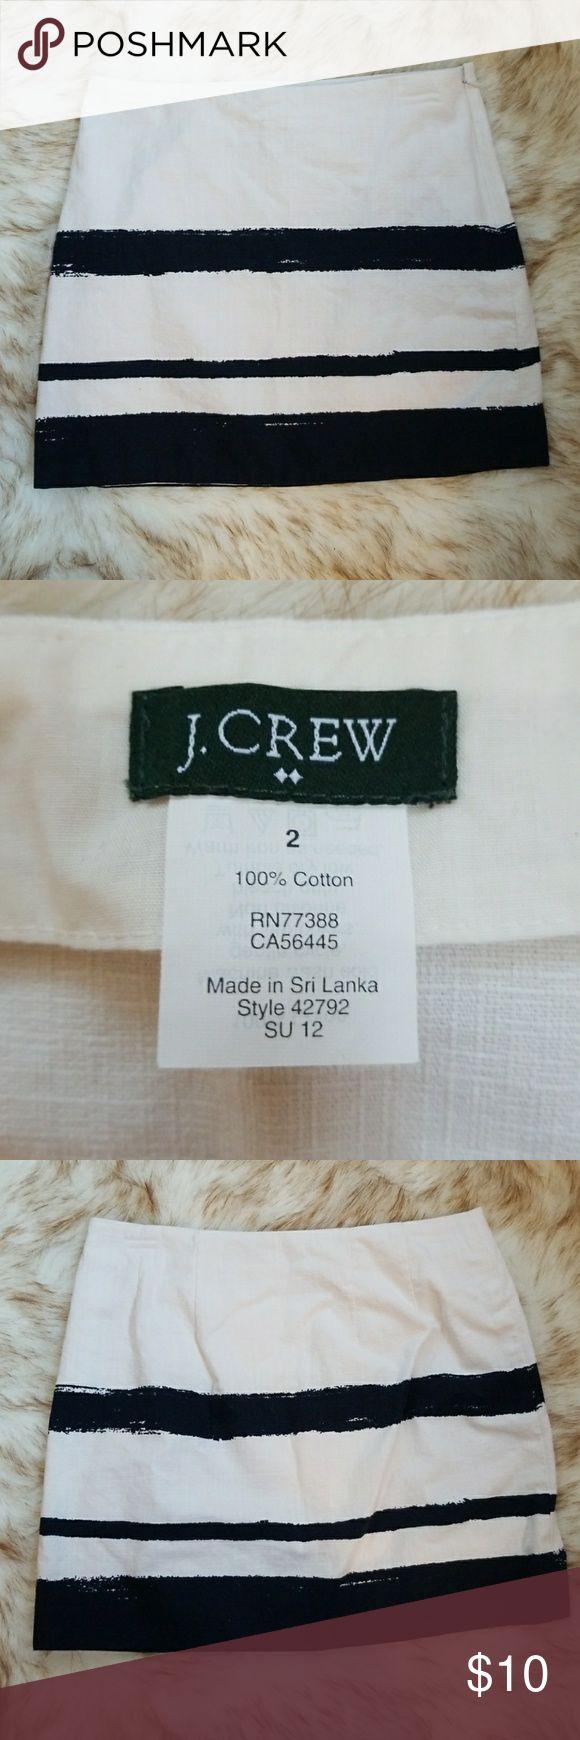 "J Crew striped skirt Ivory and navy striped skirt. 15.5"" long. Side zip. J. Crew Skirts Mini"